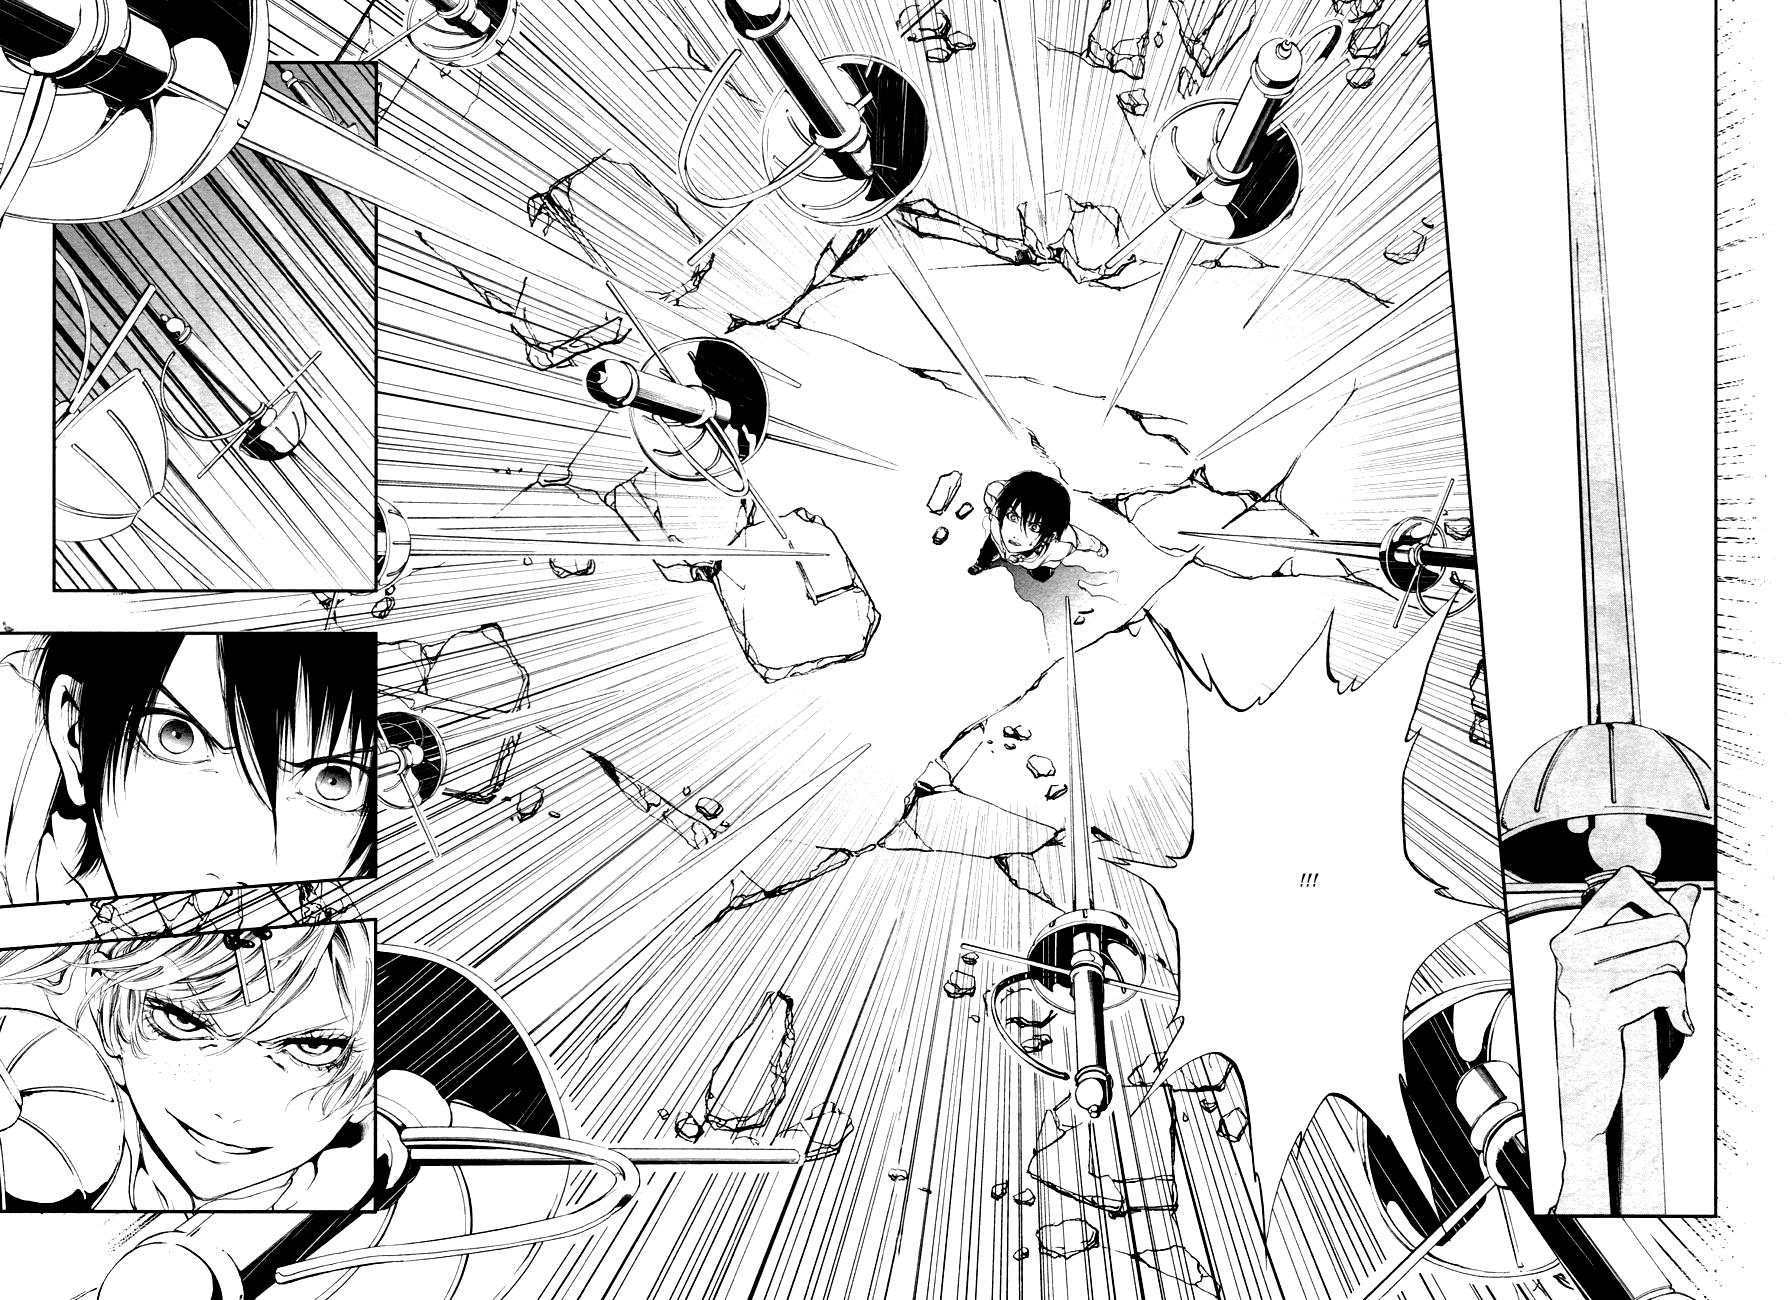 https://r1.ninemanga.com/comics/pic2/7/28807/287870/1459315109993.jpg Page 6